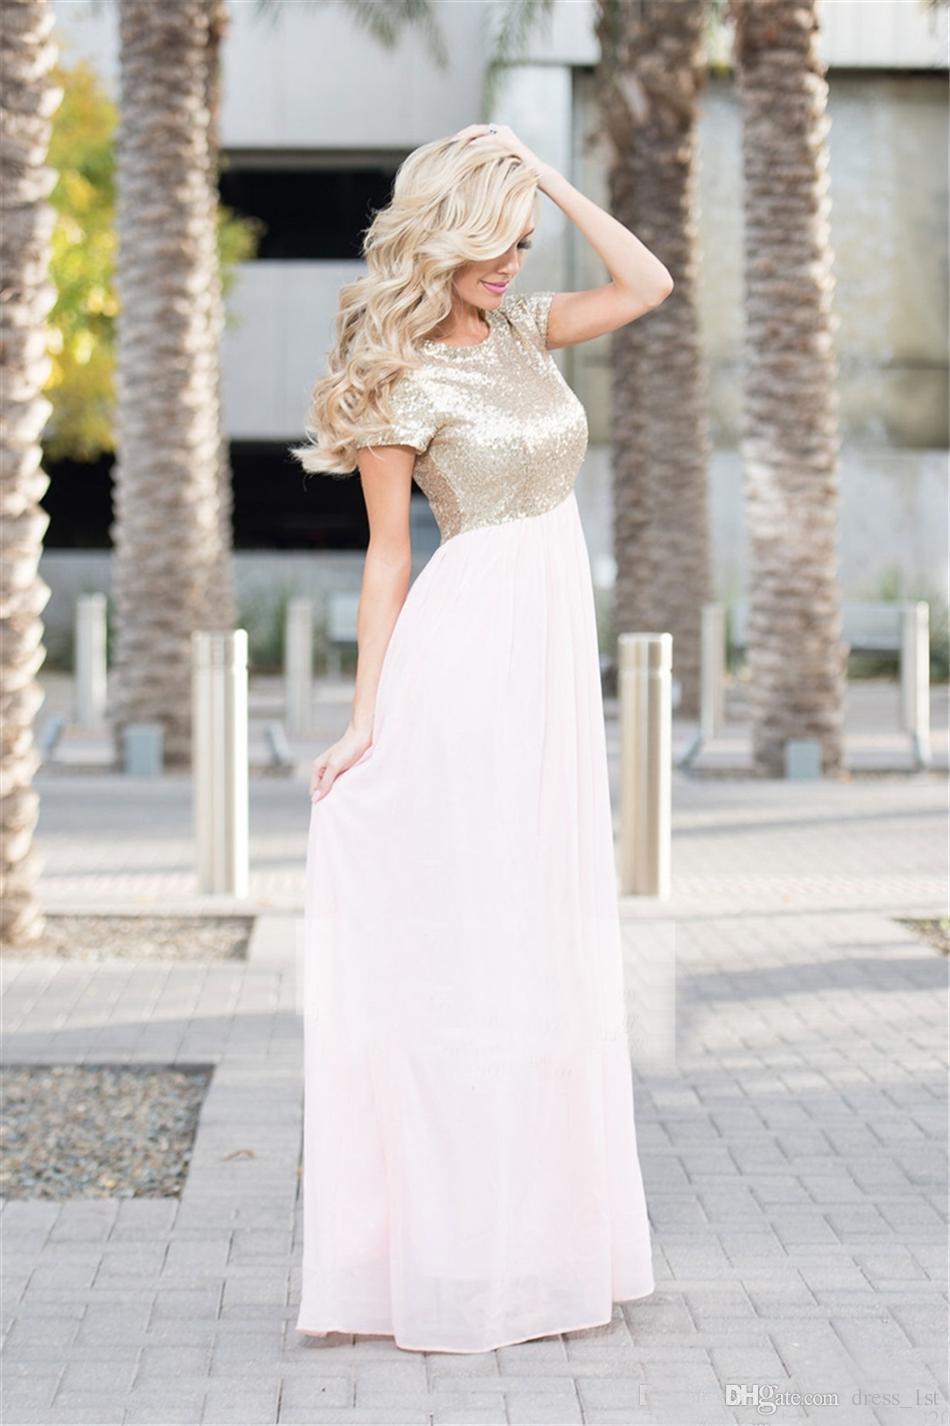 Popular 2017 Light Gold Sequin Top Light Pink Chiffon Bridesmaid Dresses Long Cheap Short Sleeve Floor Length Maid Of Honor Gowns EN3042